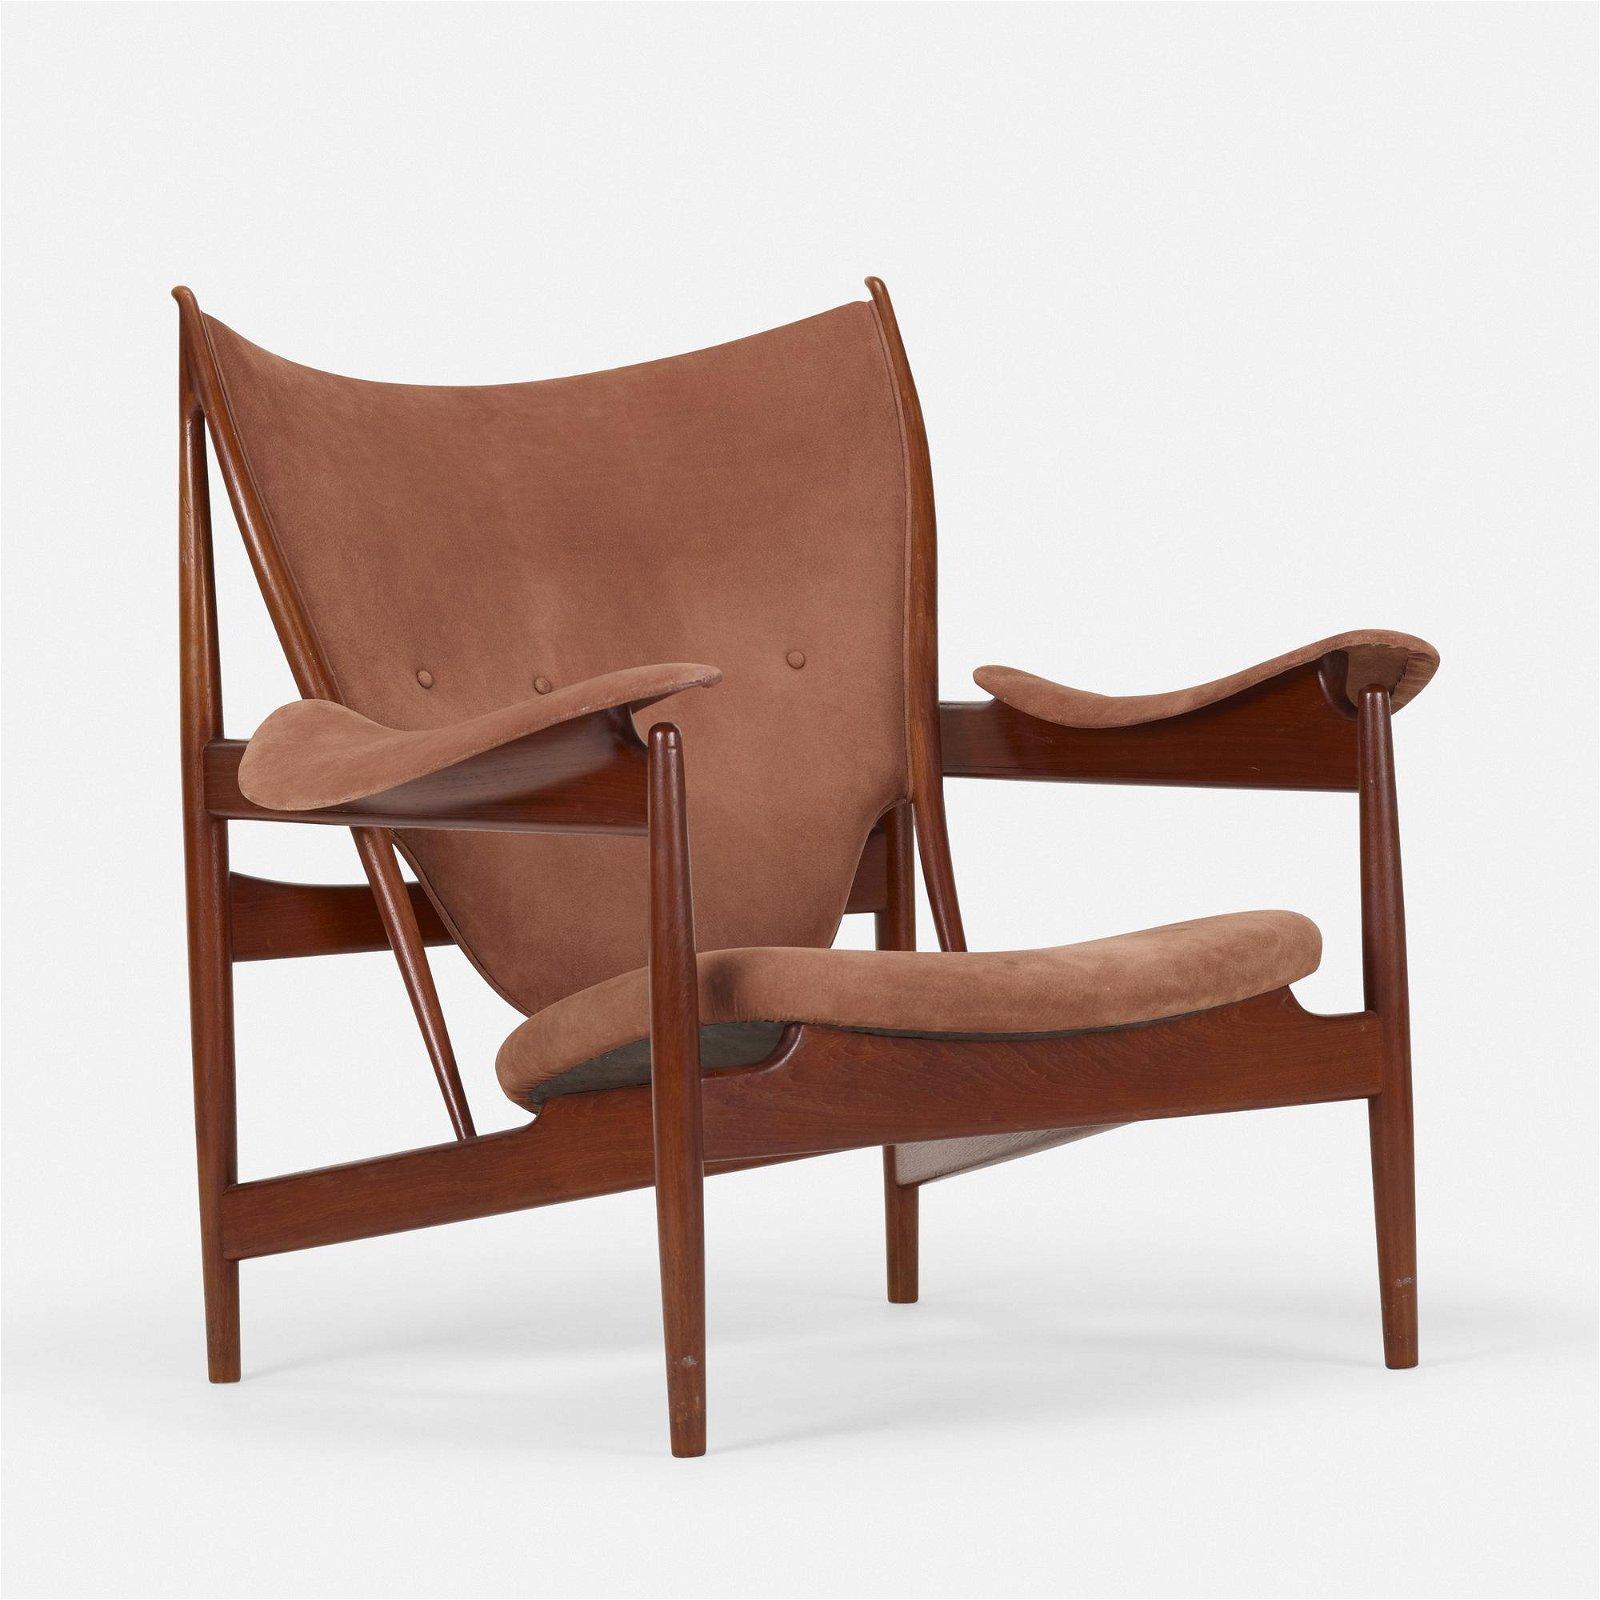 Finn Juhl, Early Chieftain lounge chair